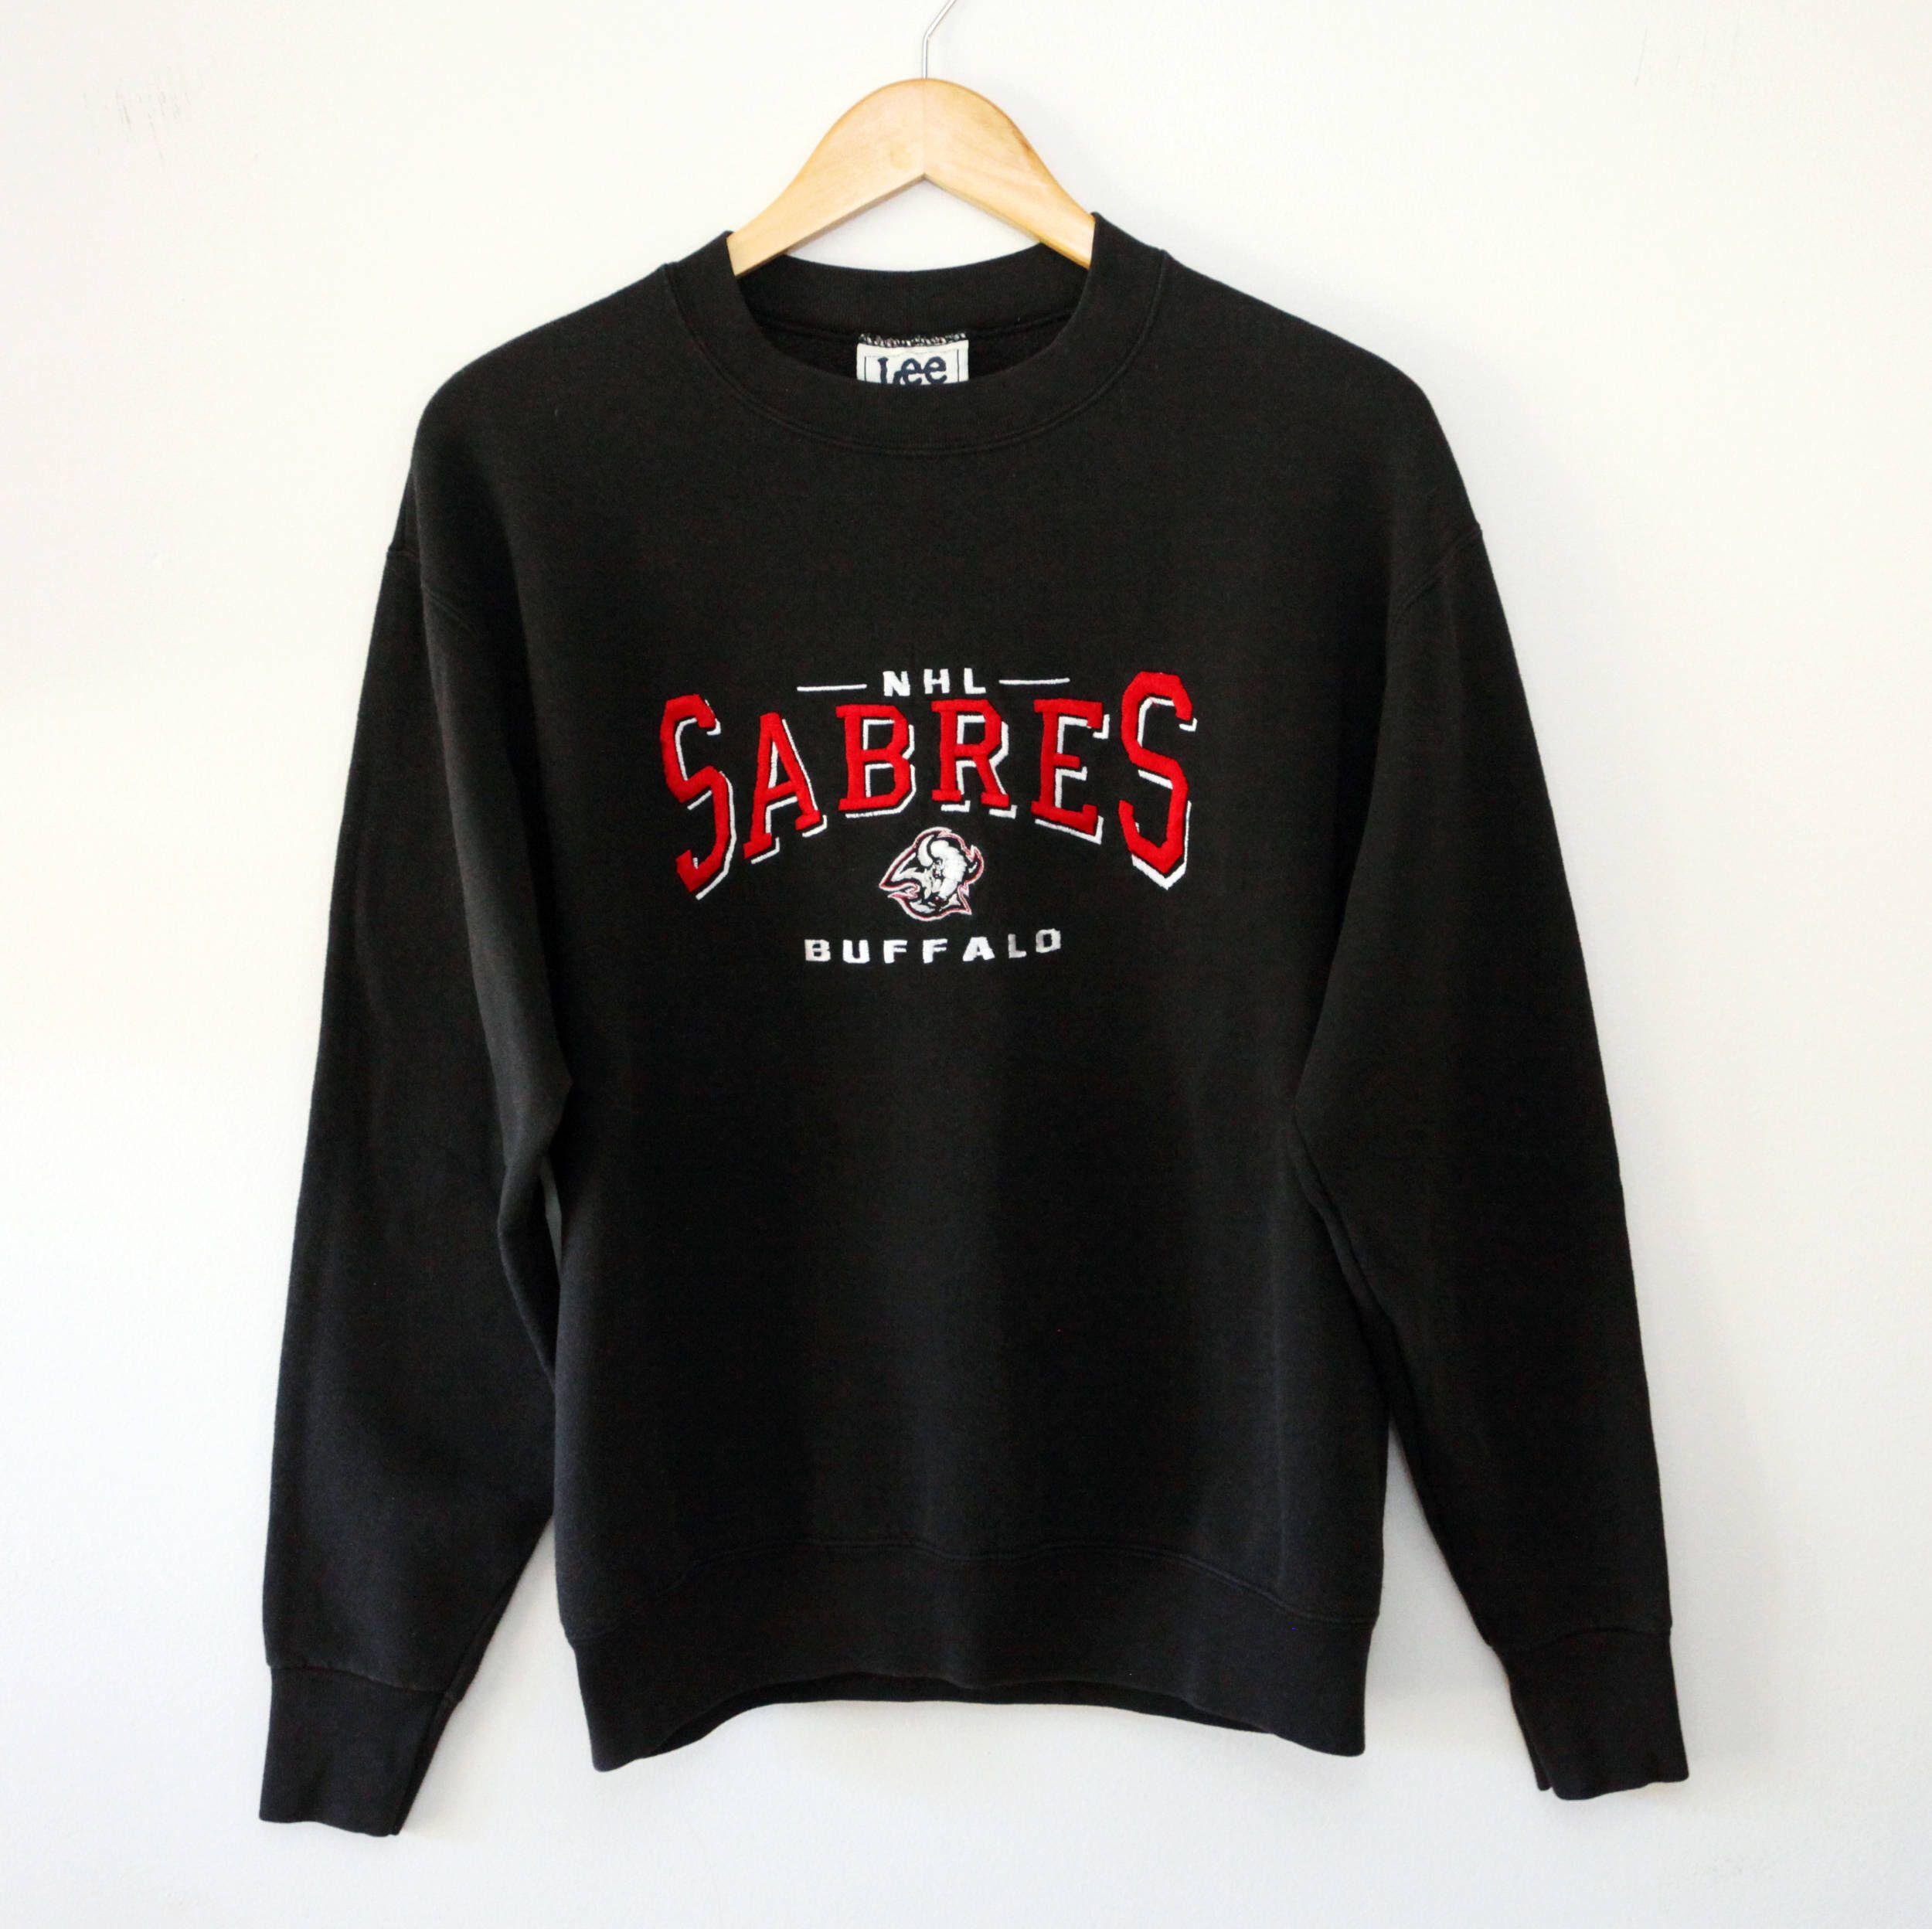 Vintage 90 S Buffalo Sabres Crewneck Sweatshirt Sz M Etsy Crew Neck Sweatshirt Sweatshirts Vintage Sportswear [ 2496 x 2500 Pixel ]